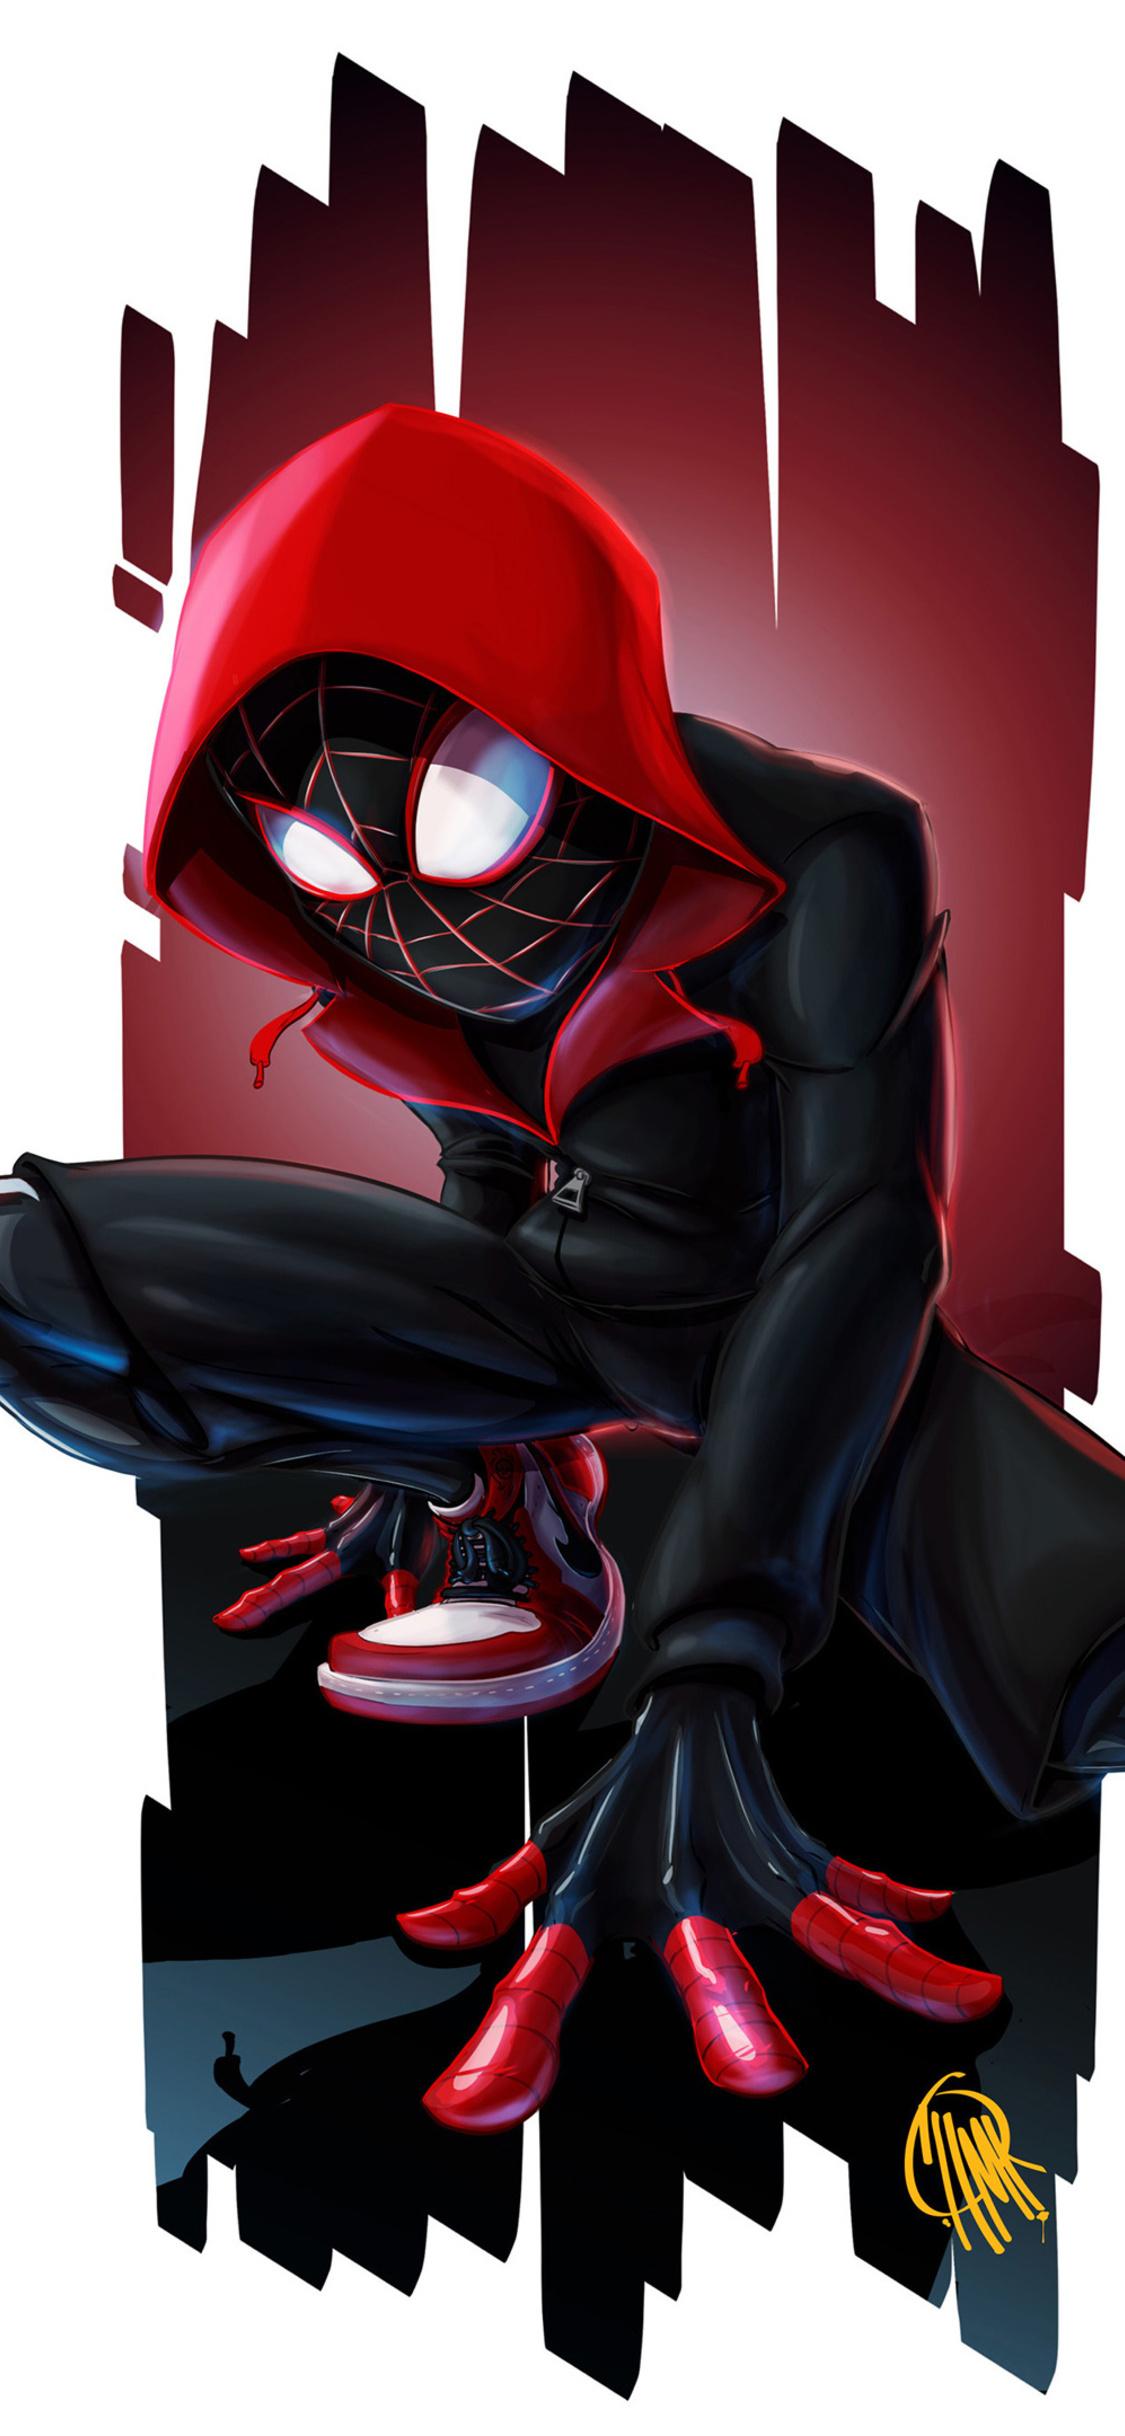 1125x2436 Spiderman Miles Morales Art 4k Iphone Xs Iphone 10